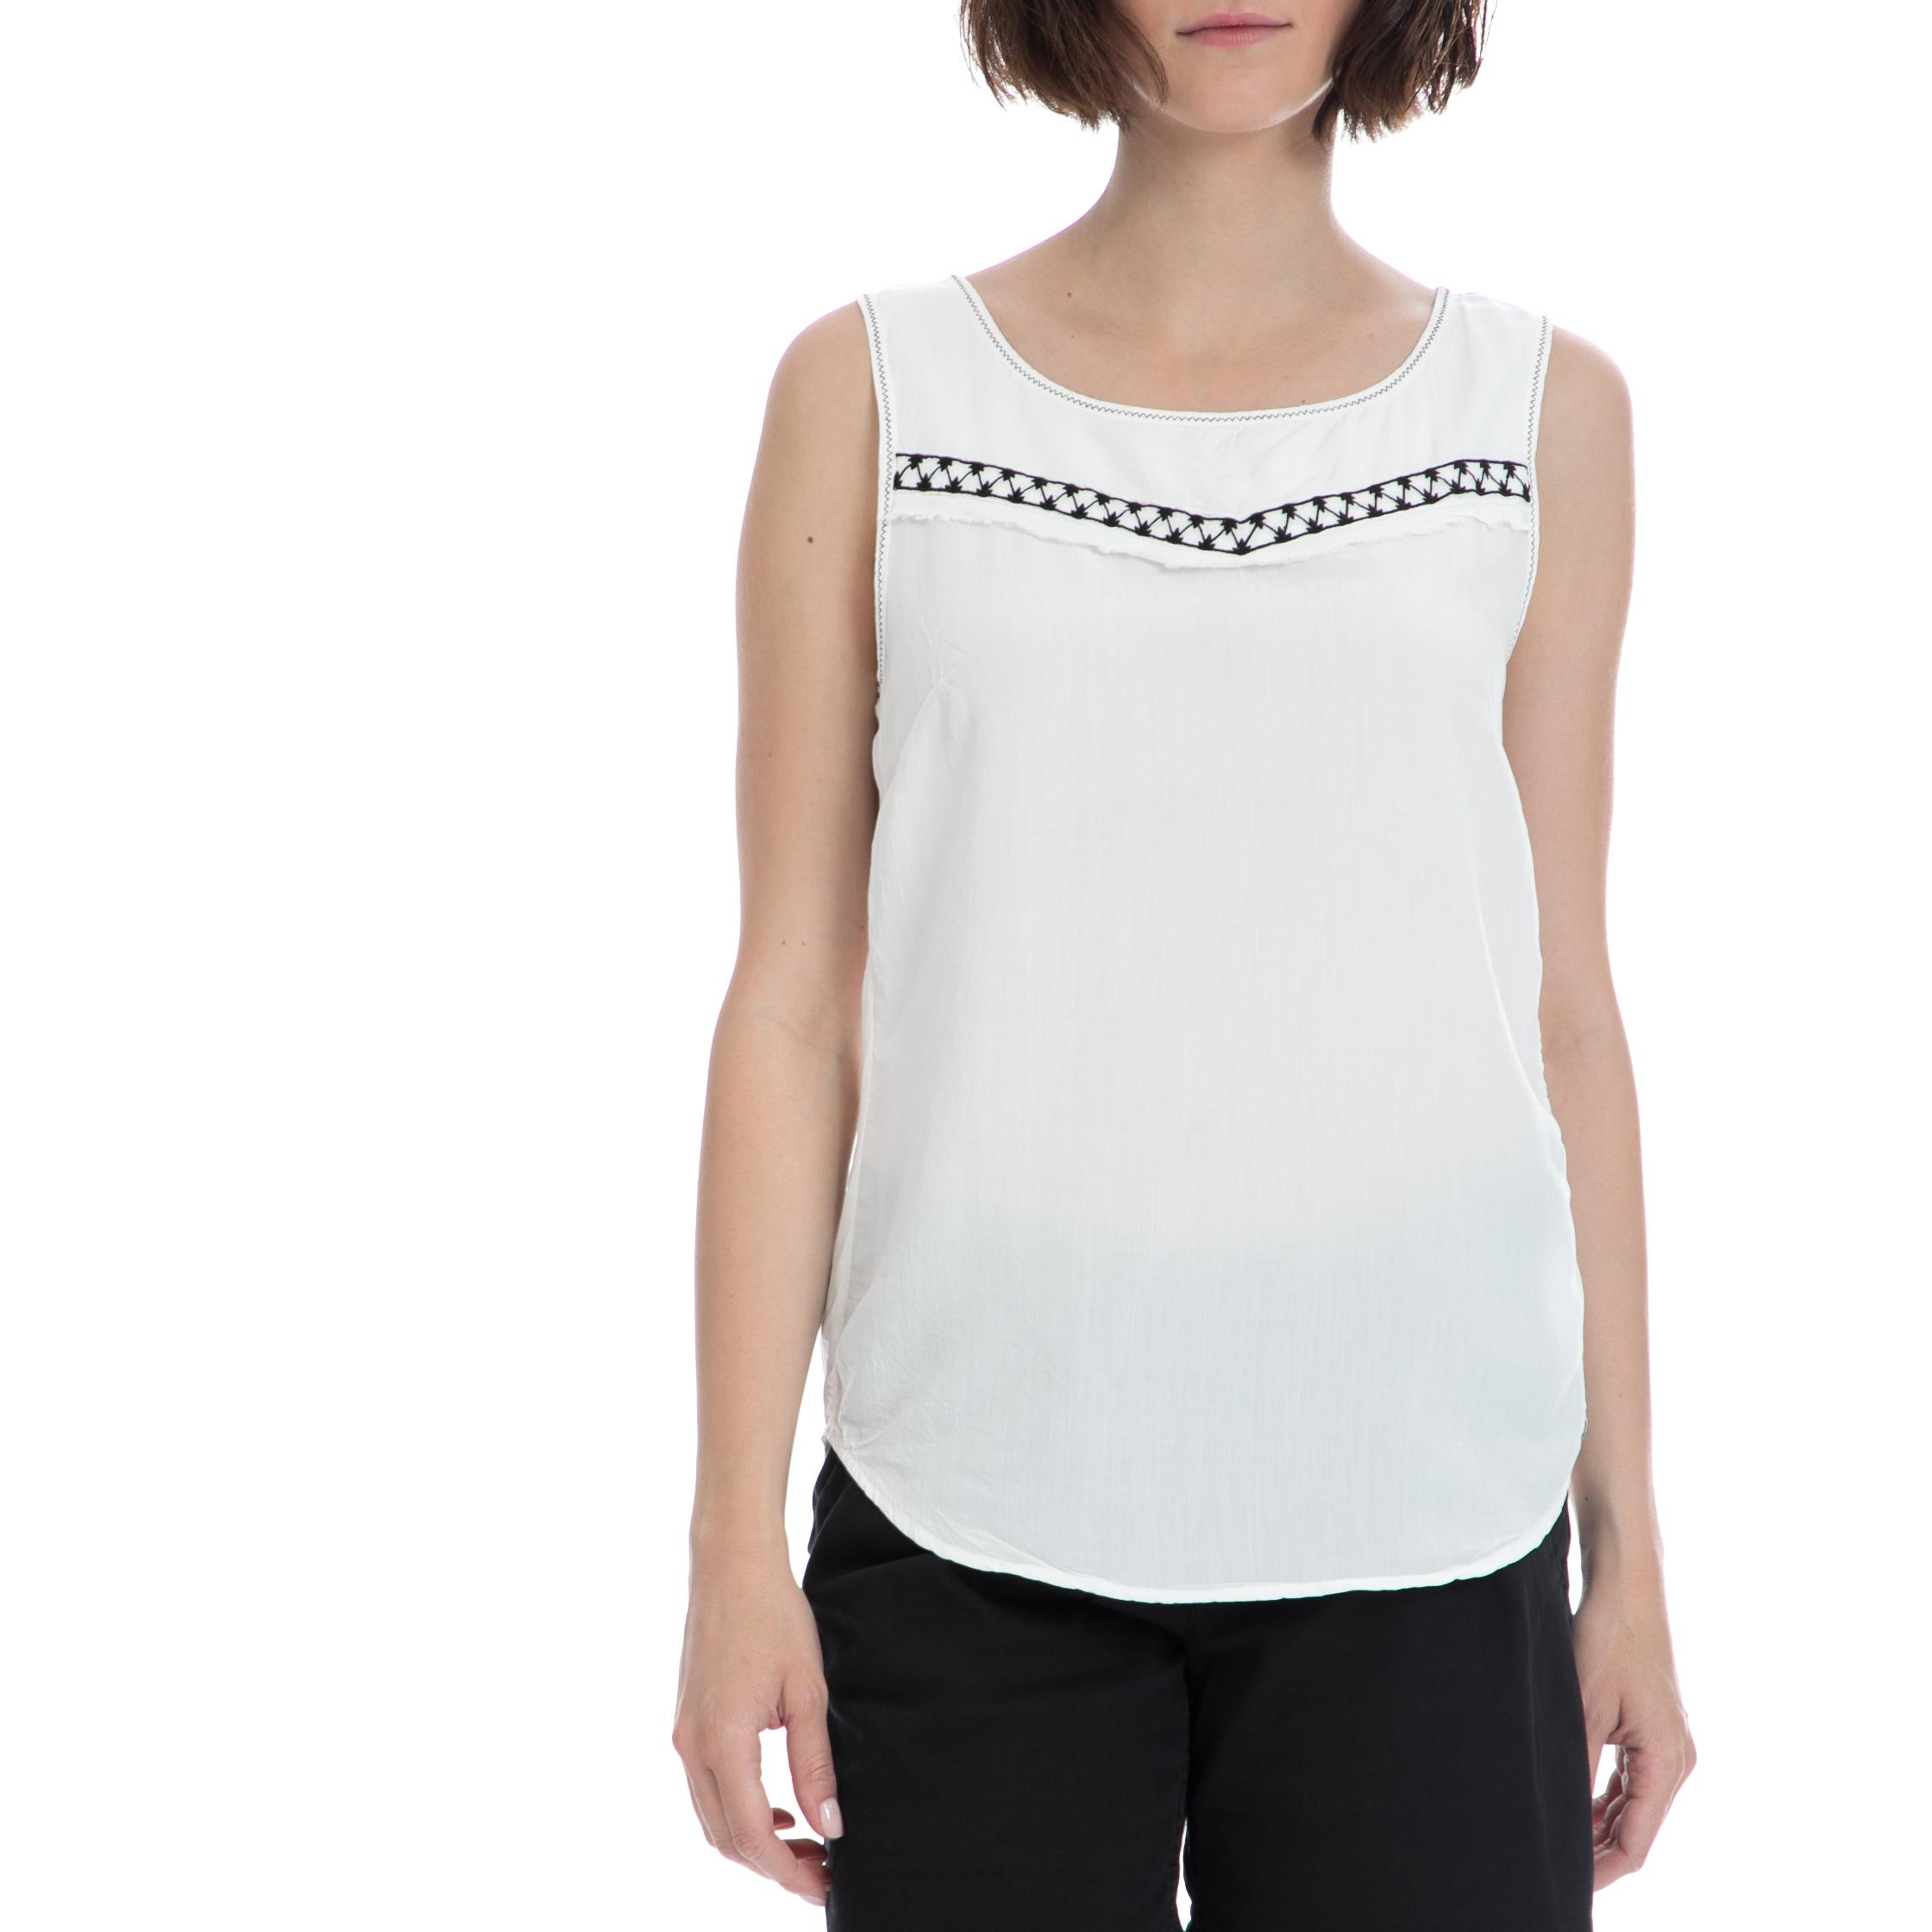 GARCIA JEANS – Γυναικείο τοπ Garcia Jeans λευκό